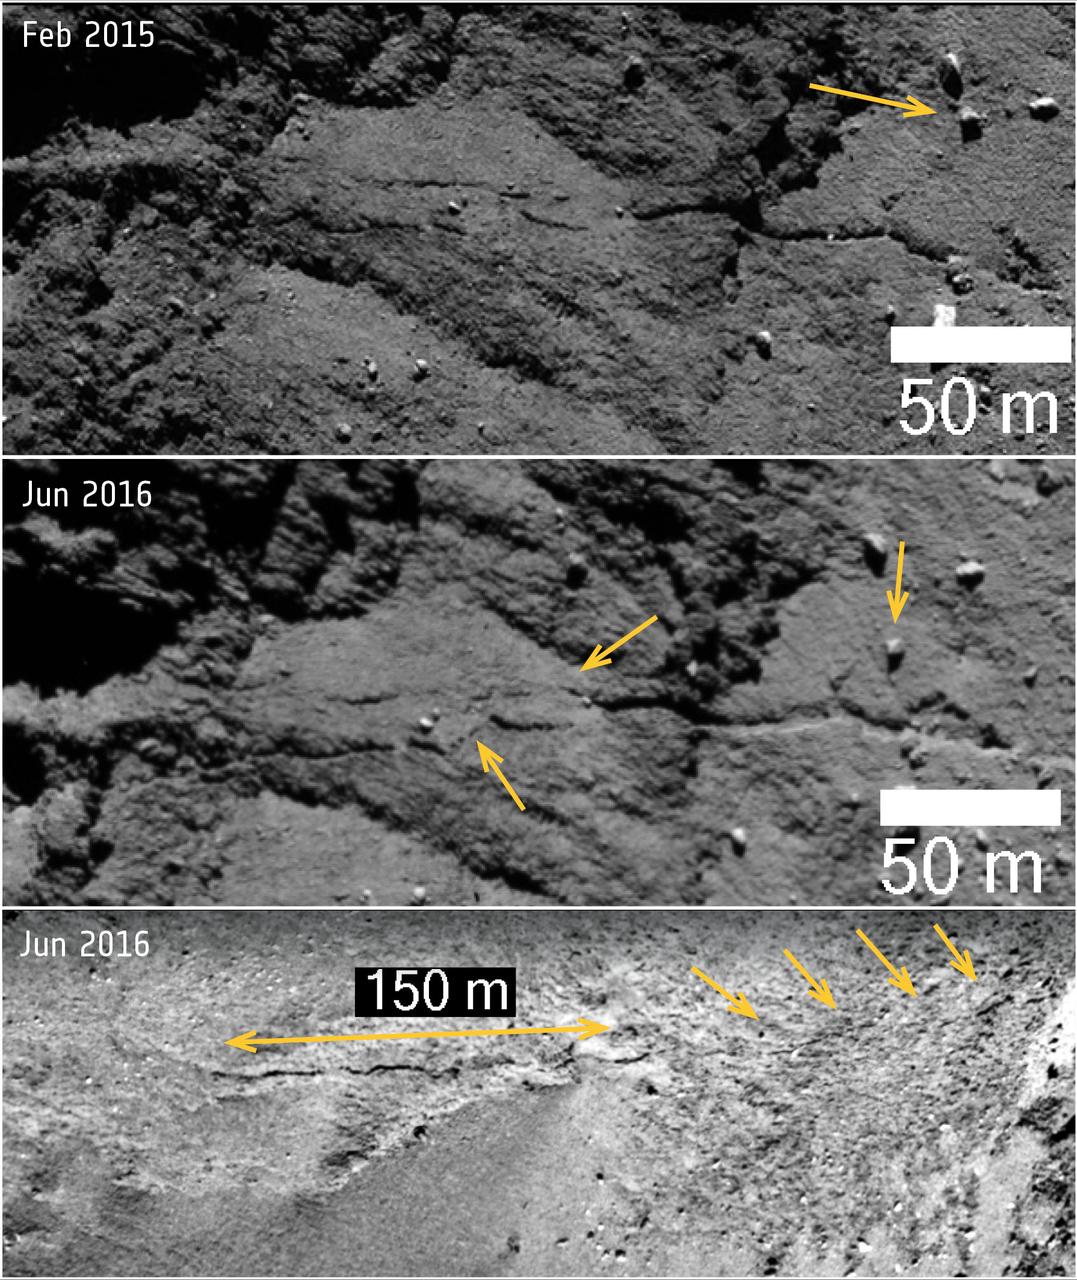 1567215190624-ESA_Rosetta_CometChanges_FractureBoulder_1280.jpg